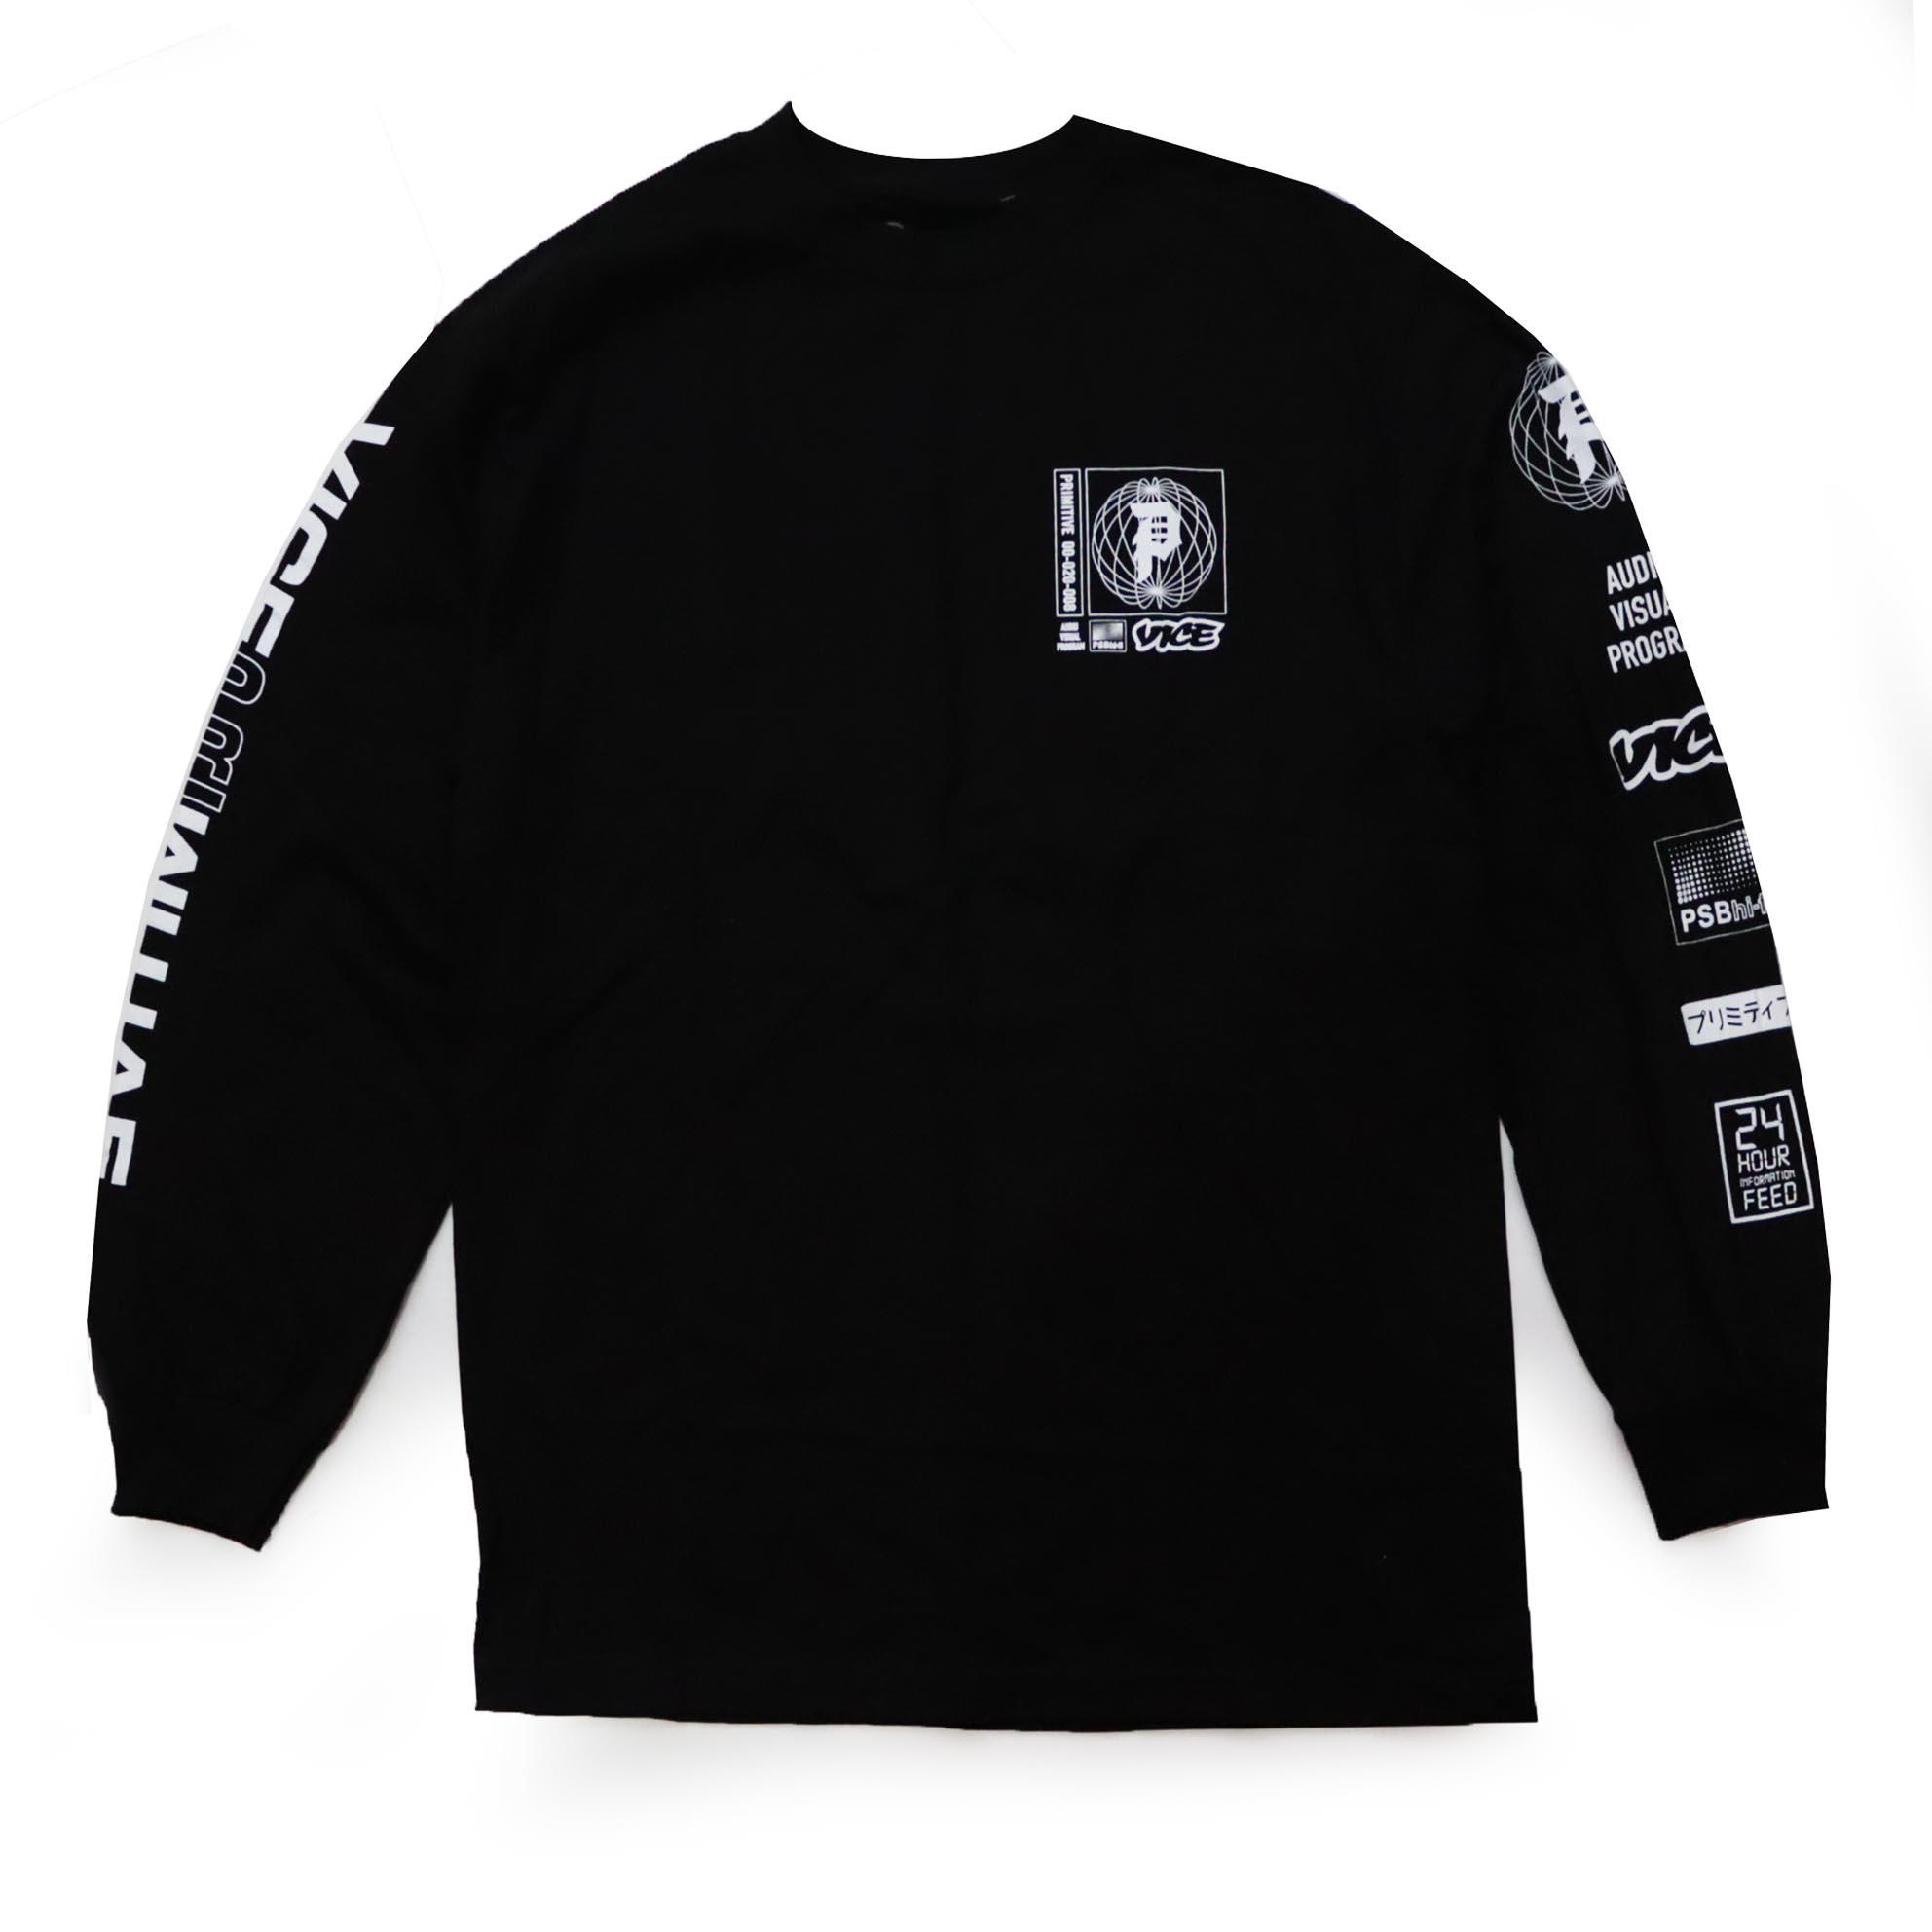 Camiseta Manga Longa Primitive x Vice Feed - Preto (Importado)